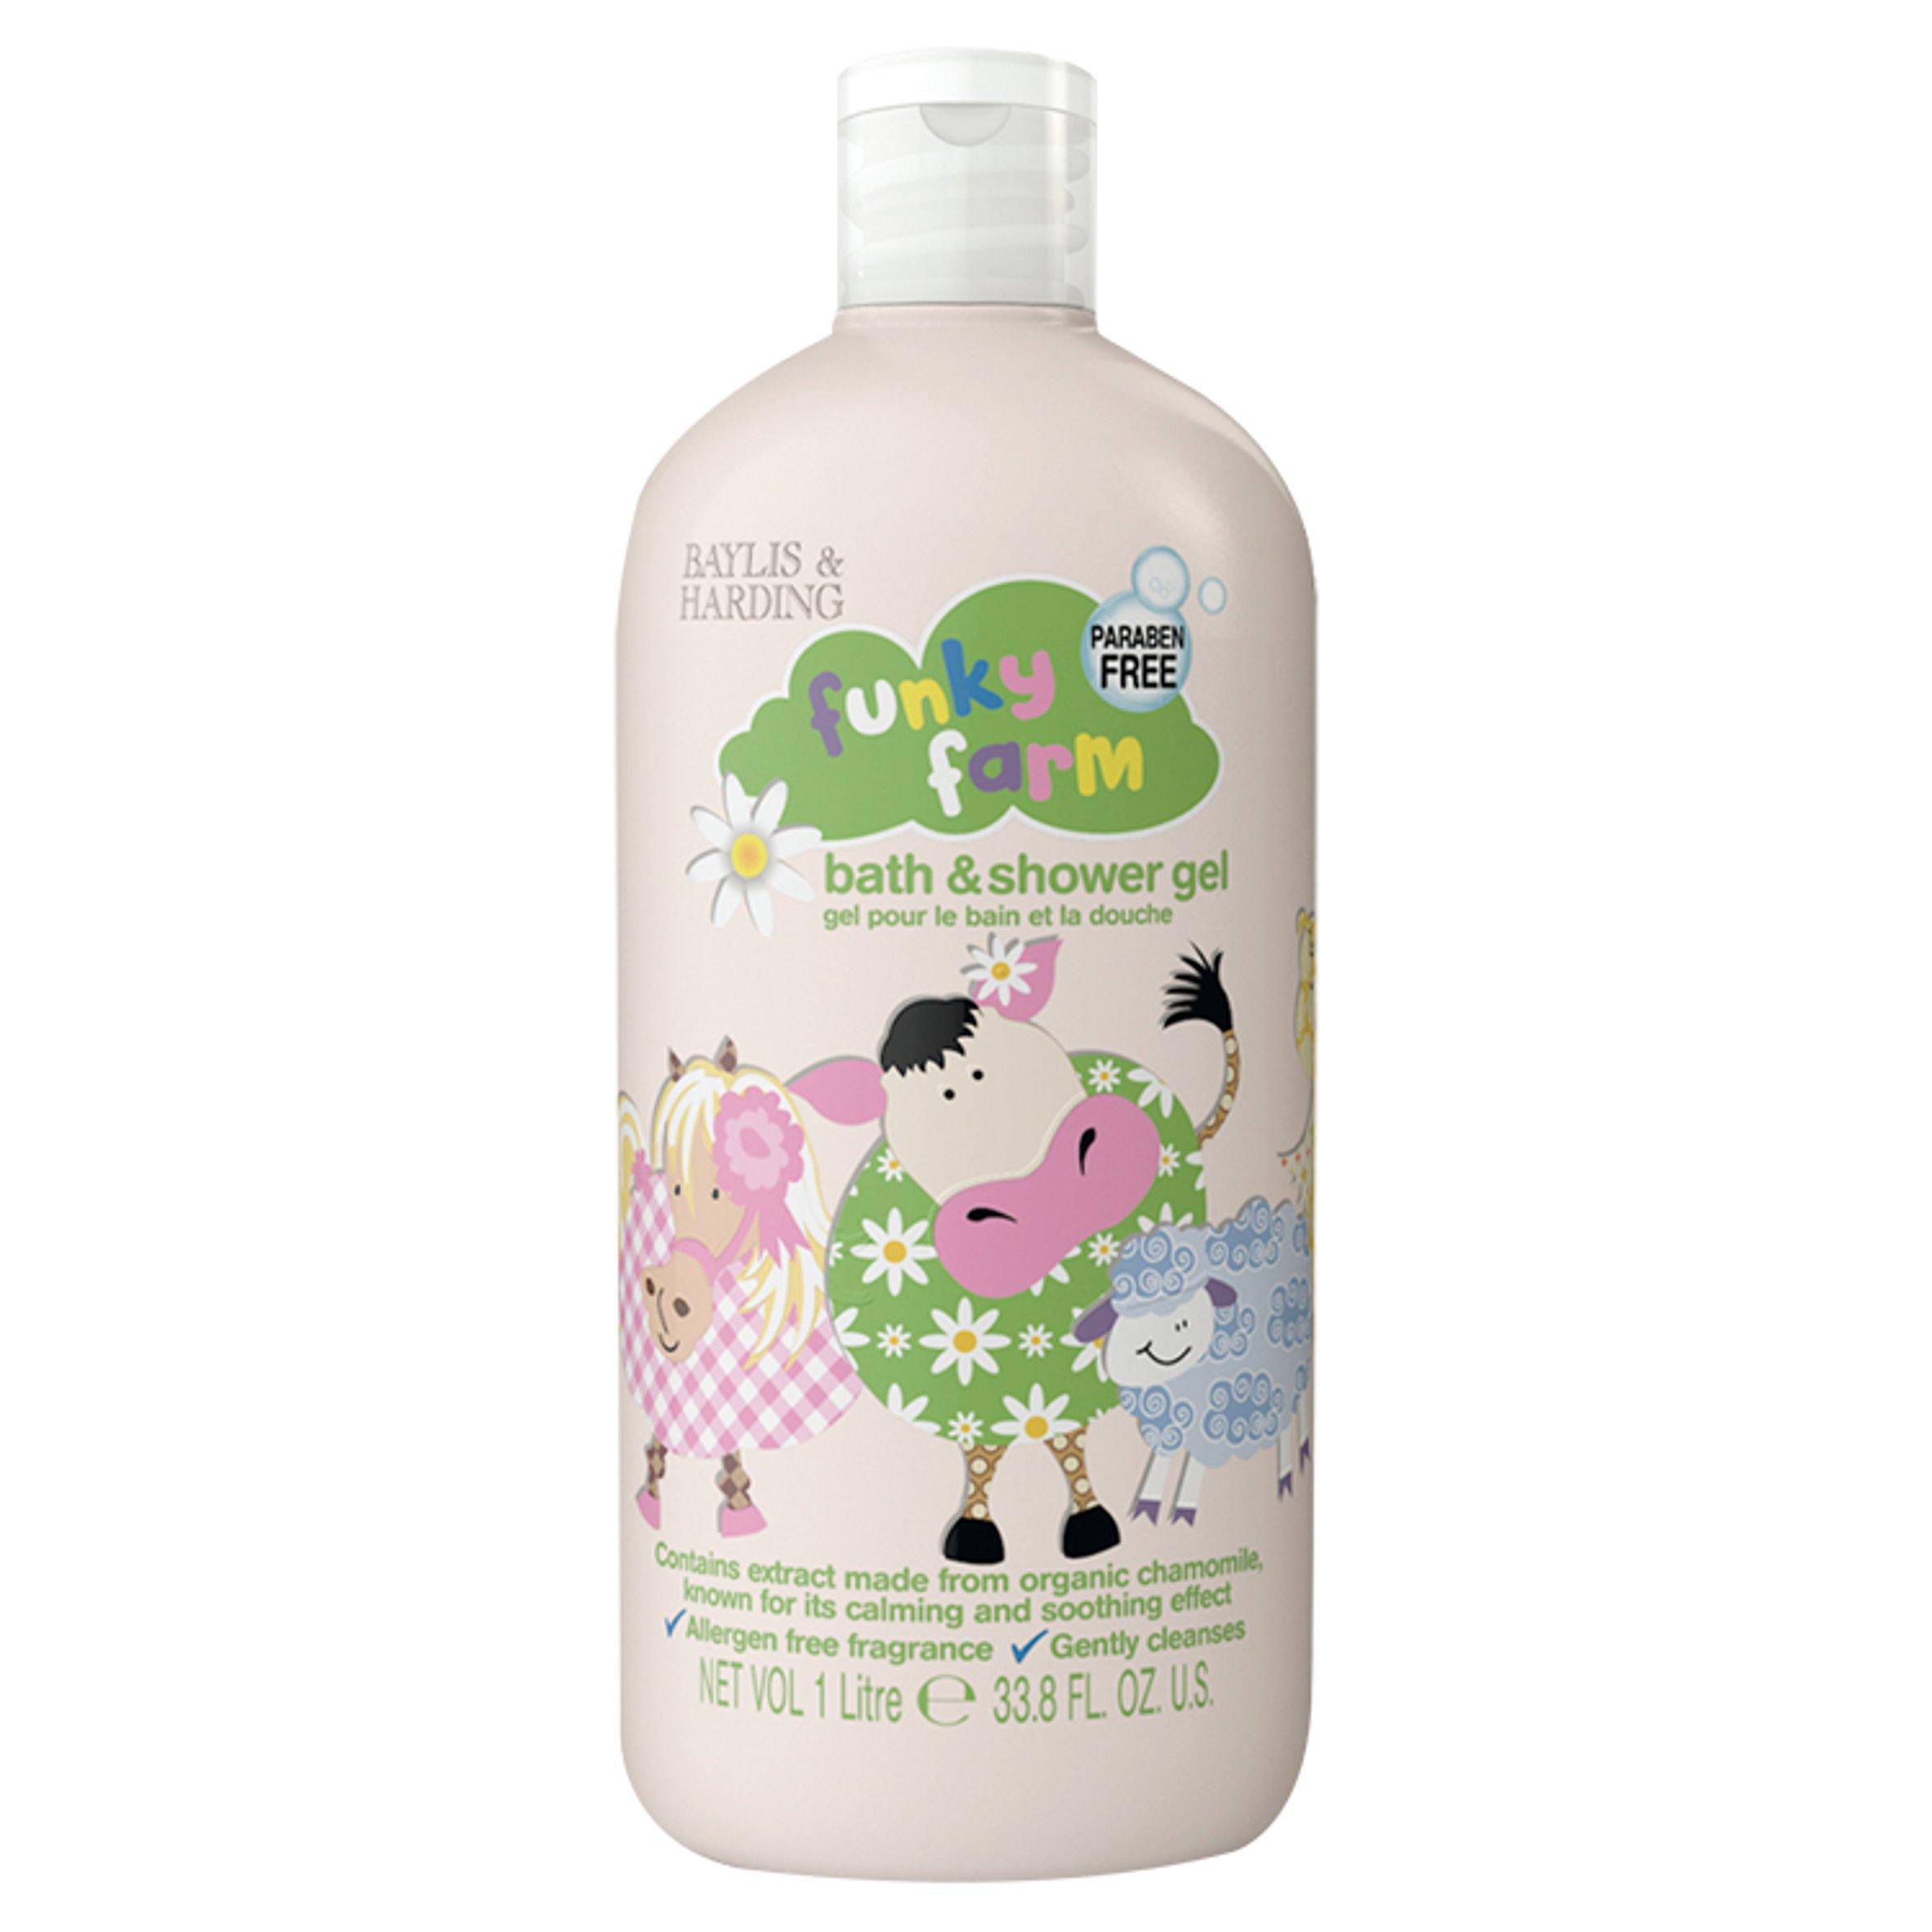 Funky Farm Bath & Shower Gel 1 Litre